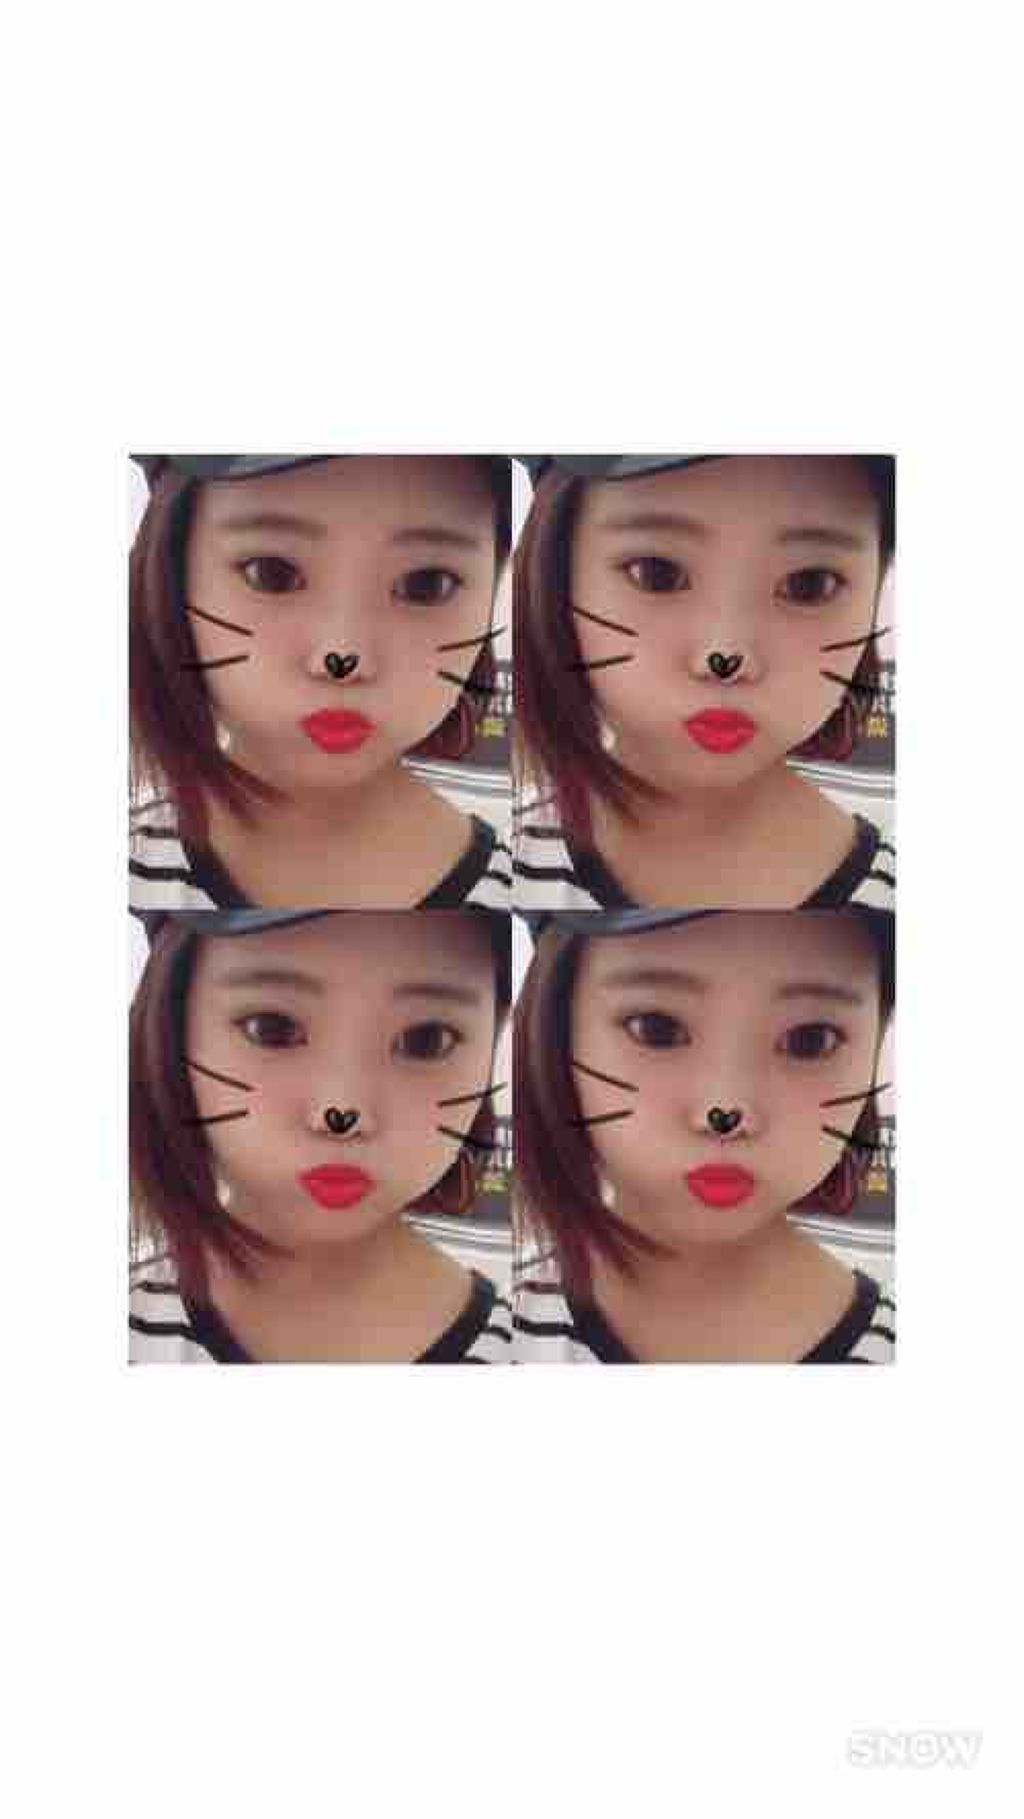 supreme_lips_6lp